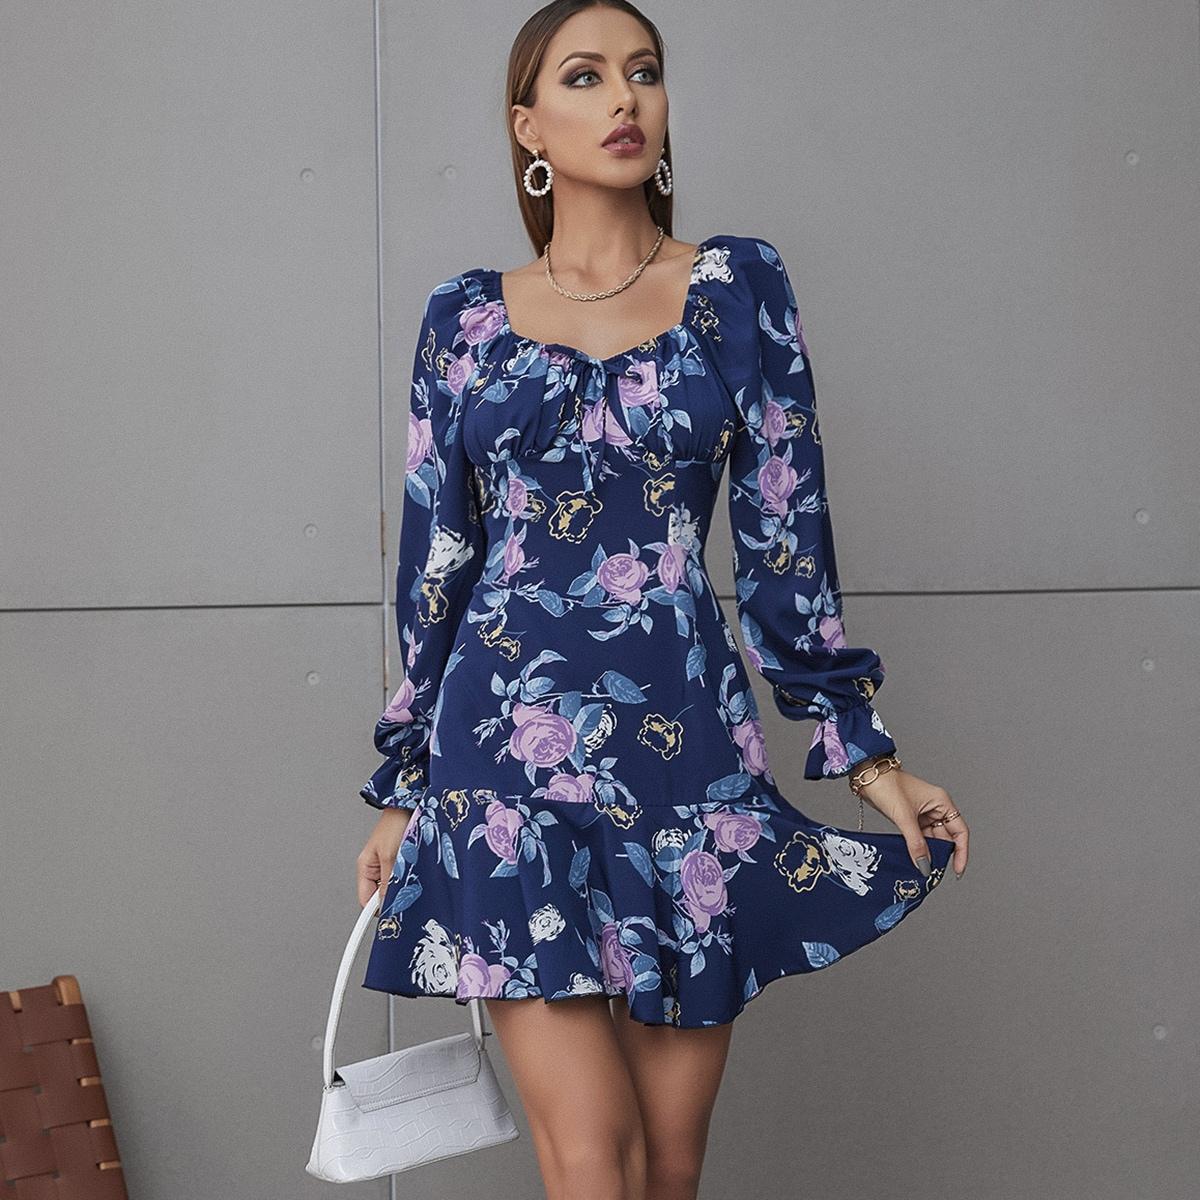 Floral Print Flounce Sleeve Sweetheart Neck Tie Front Ruffle Hem Dress